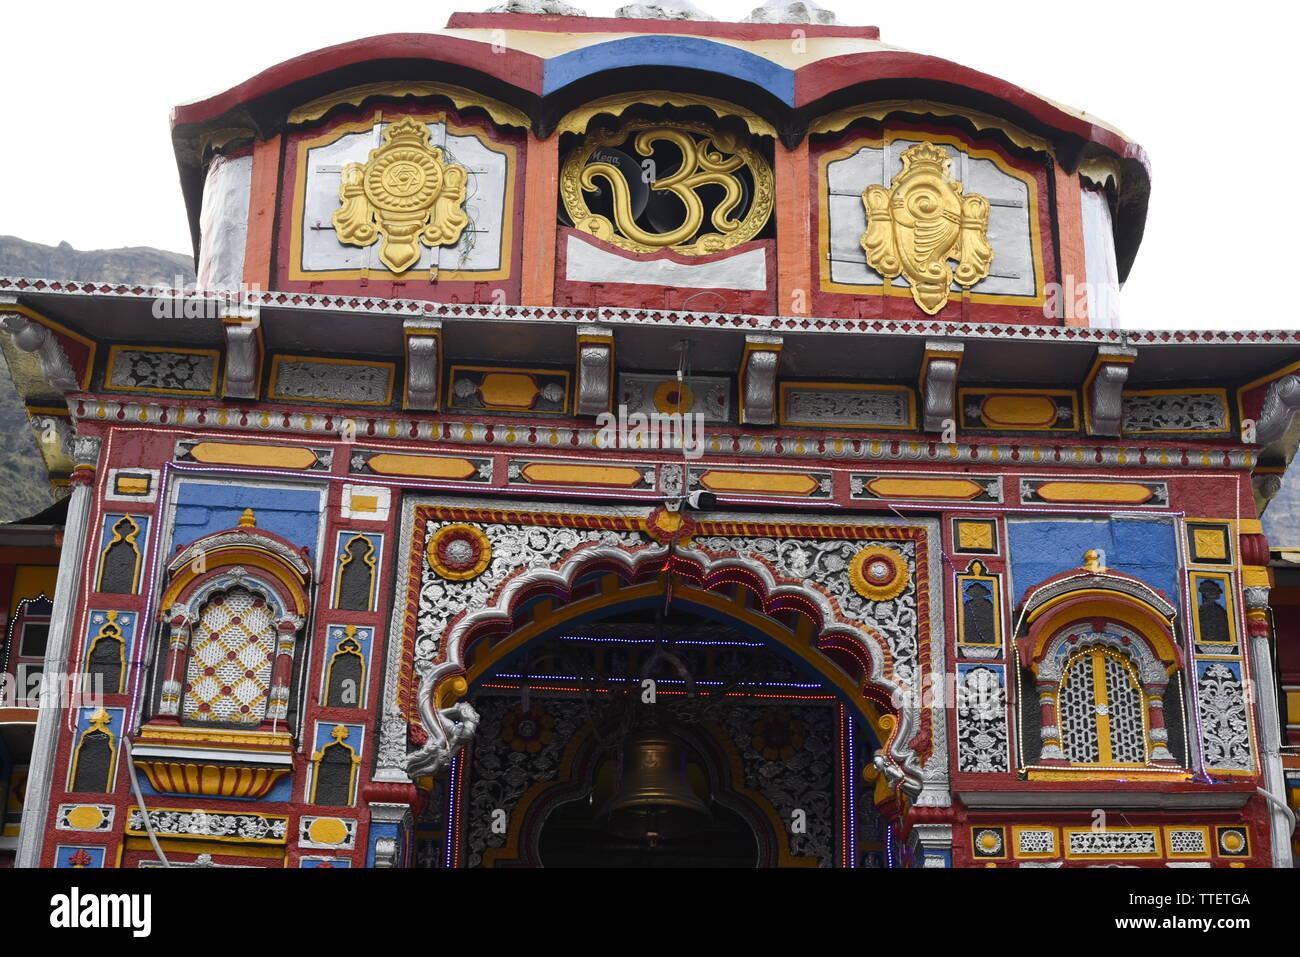 Lieu Saint Seigneur Vishnu Temple Badrinath Badrinath, 2019 Ville, District Chamoli, Uttrakhand, Inde, Asie Banque D'Images